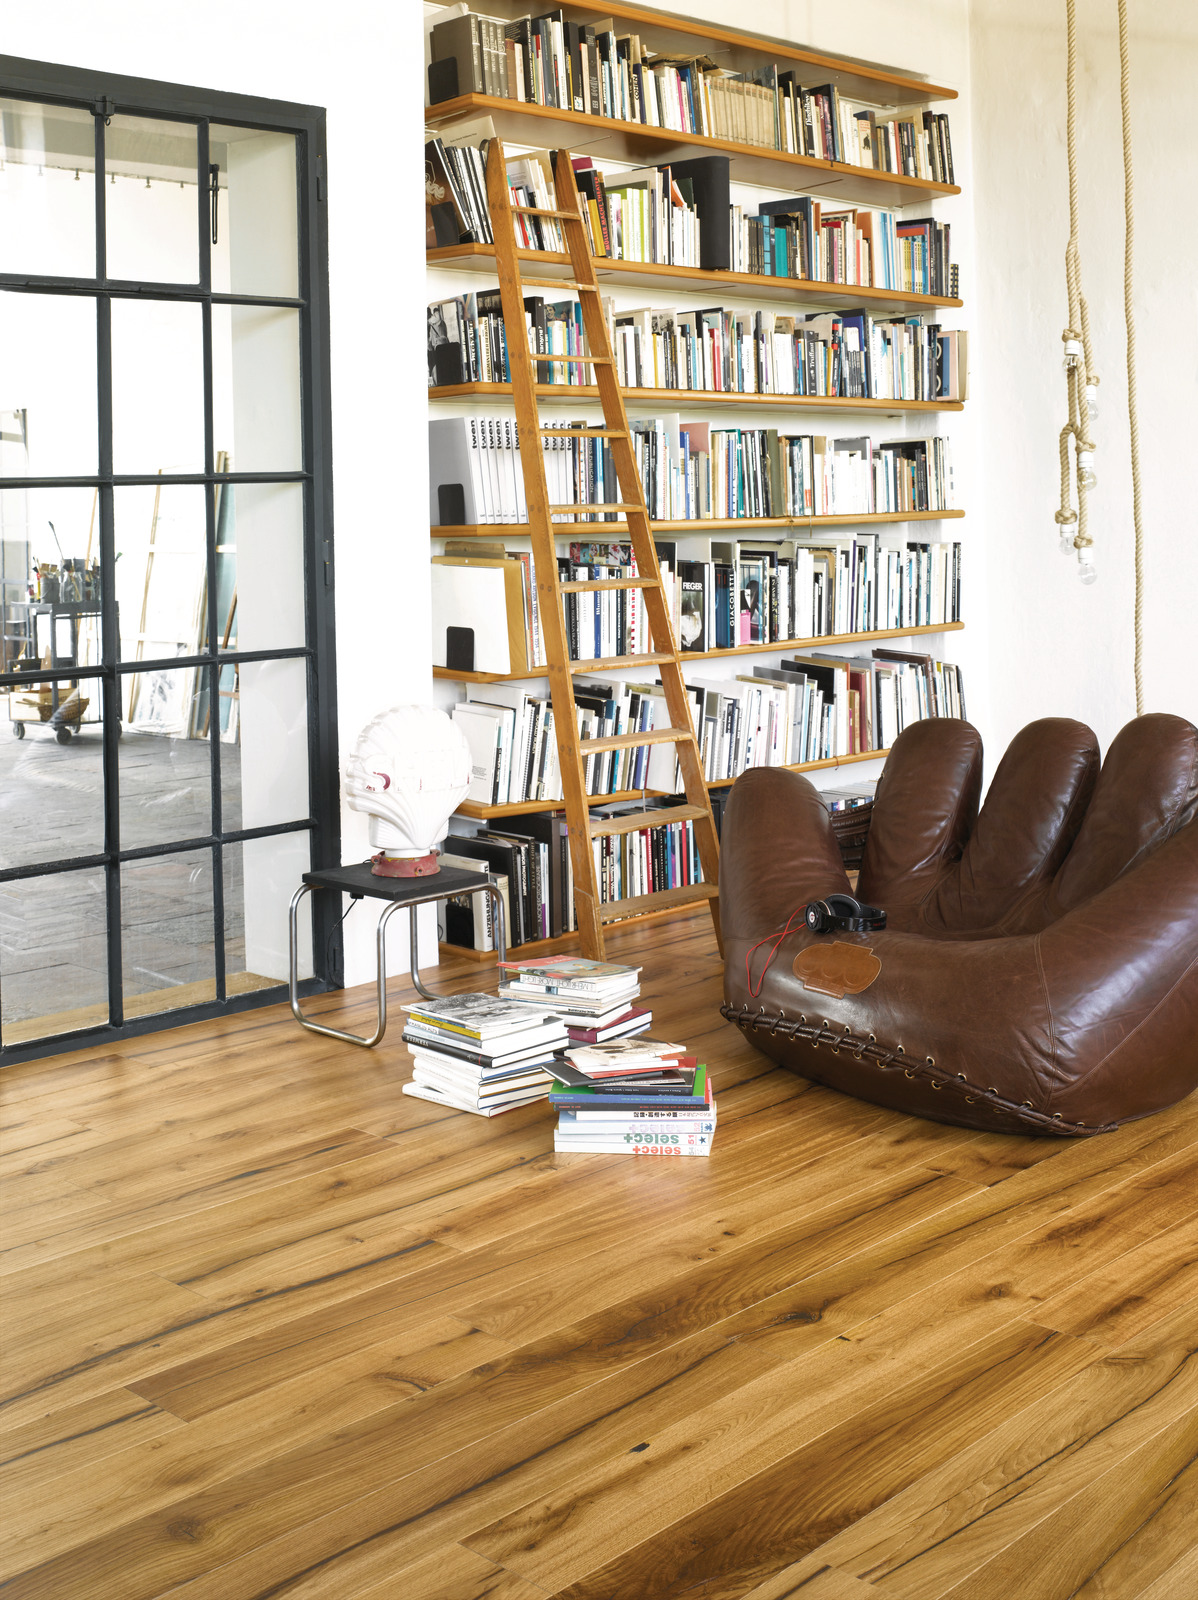 Podloga drewniana inspiracje 4